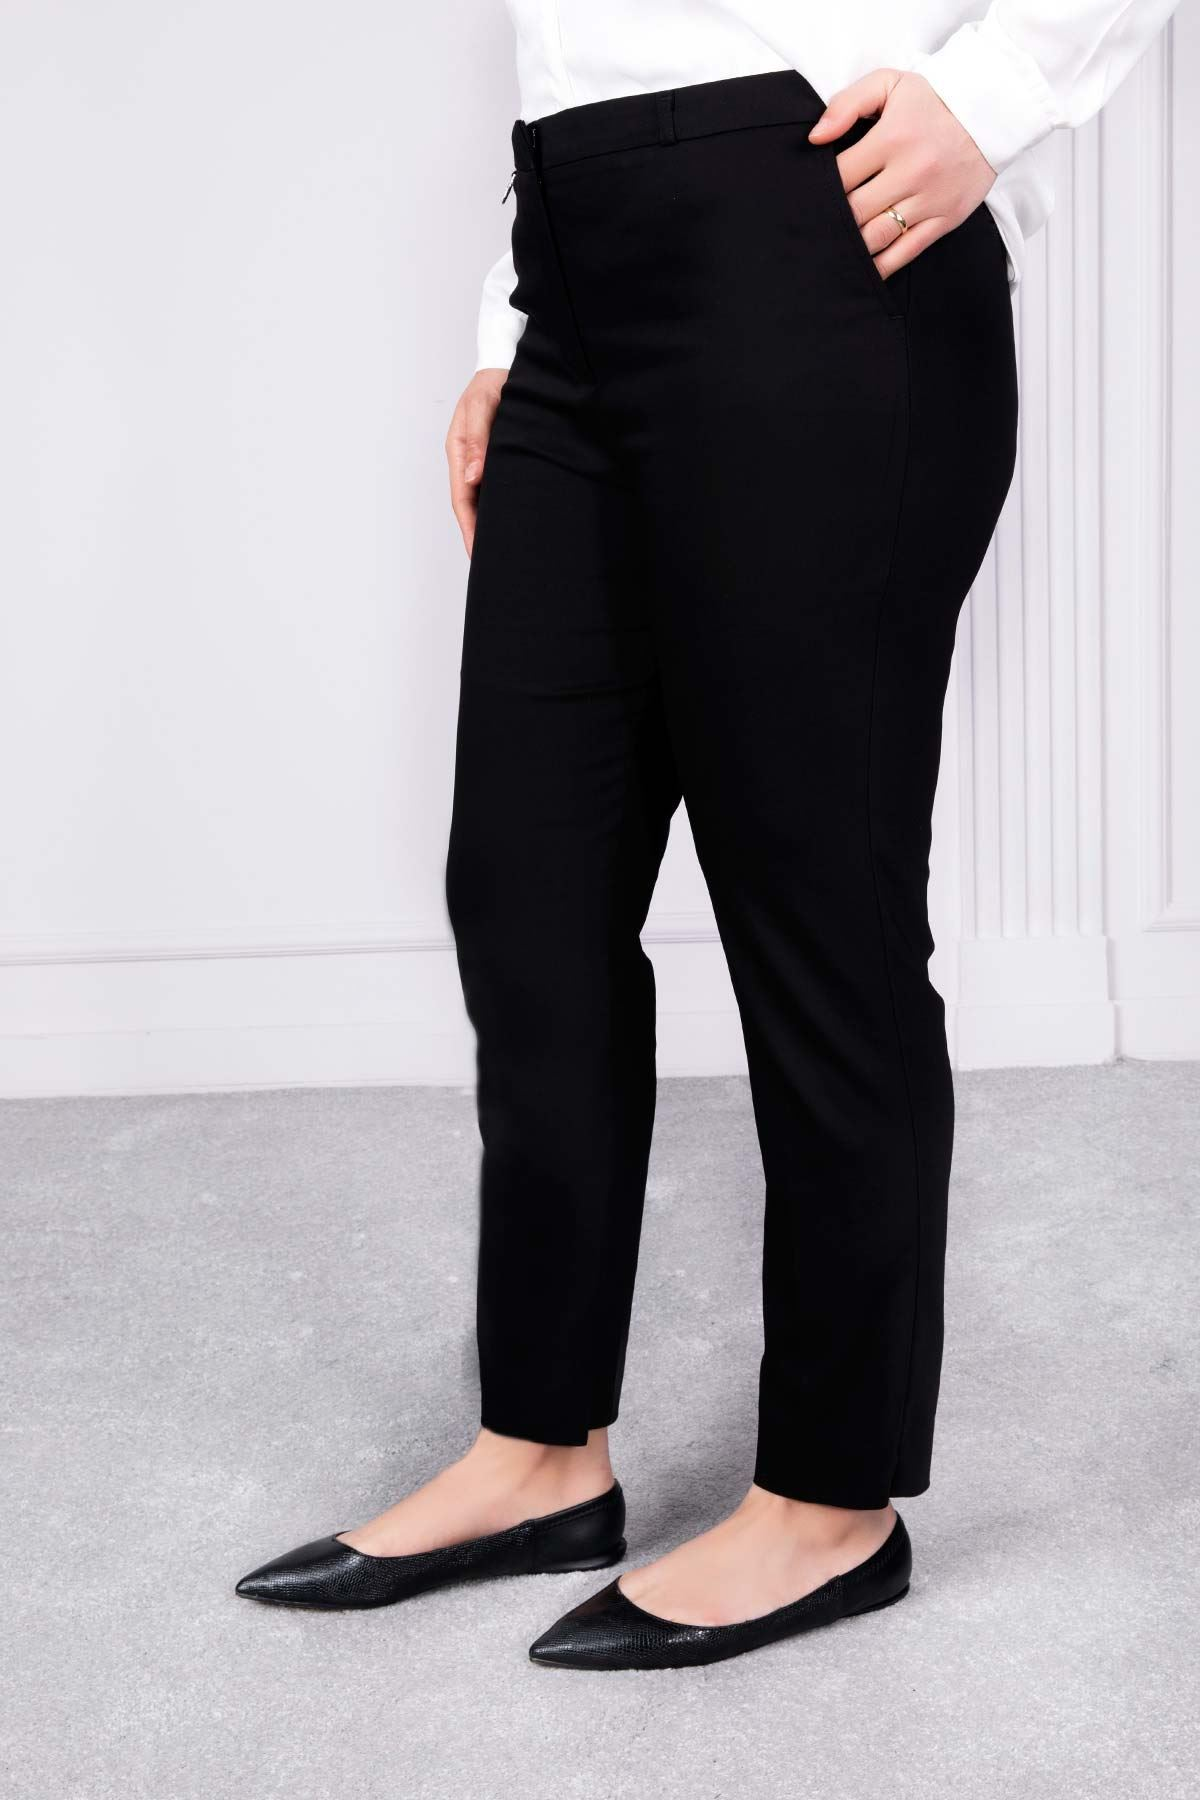 Yırtmaç Detaylı Sigaret Pantolon Siyah 2139-45